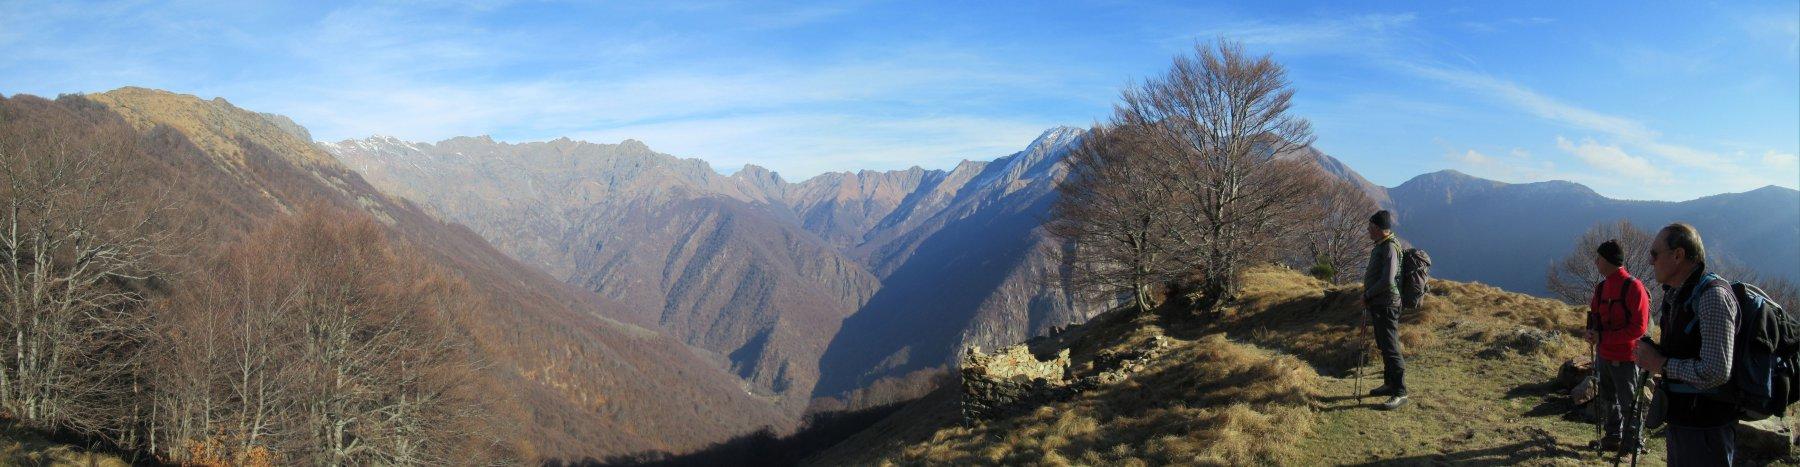 Panorama dall'alpe Leciuri m. 1311